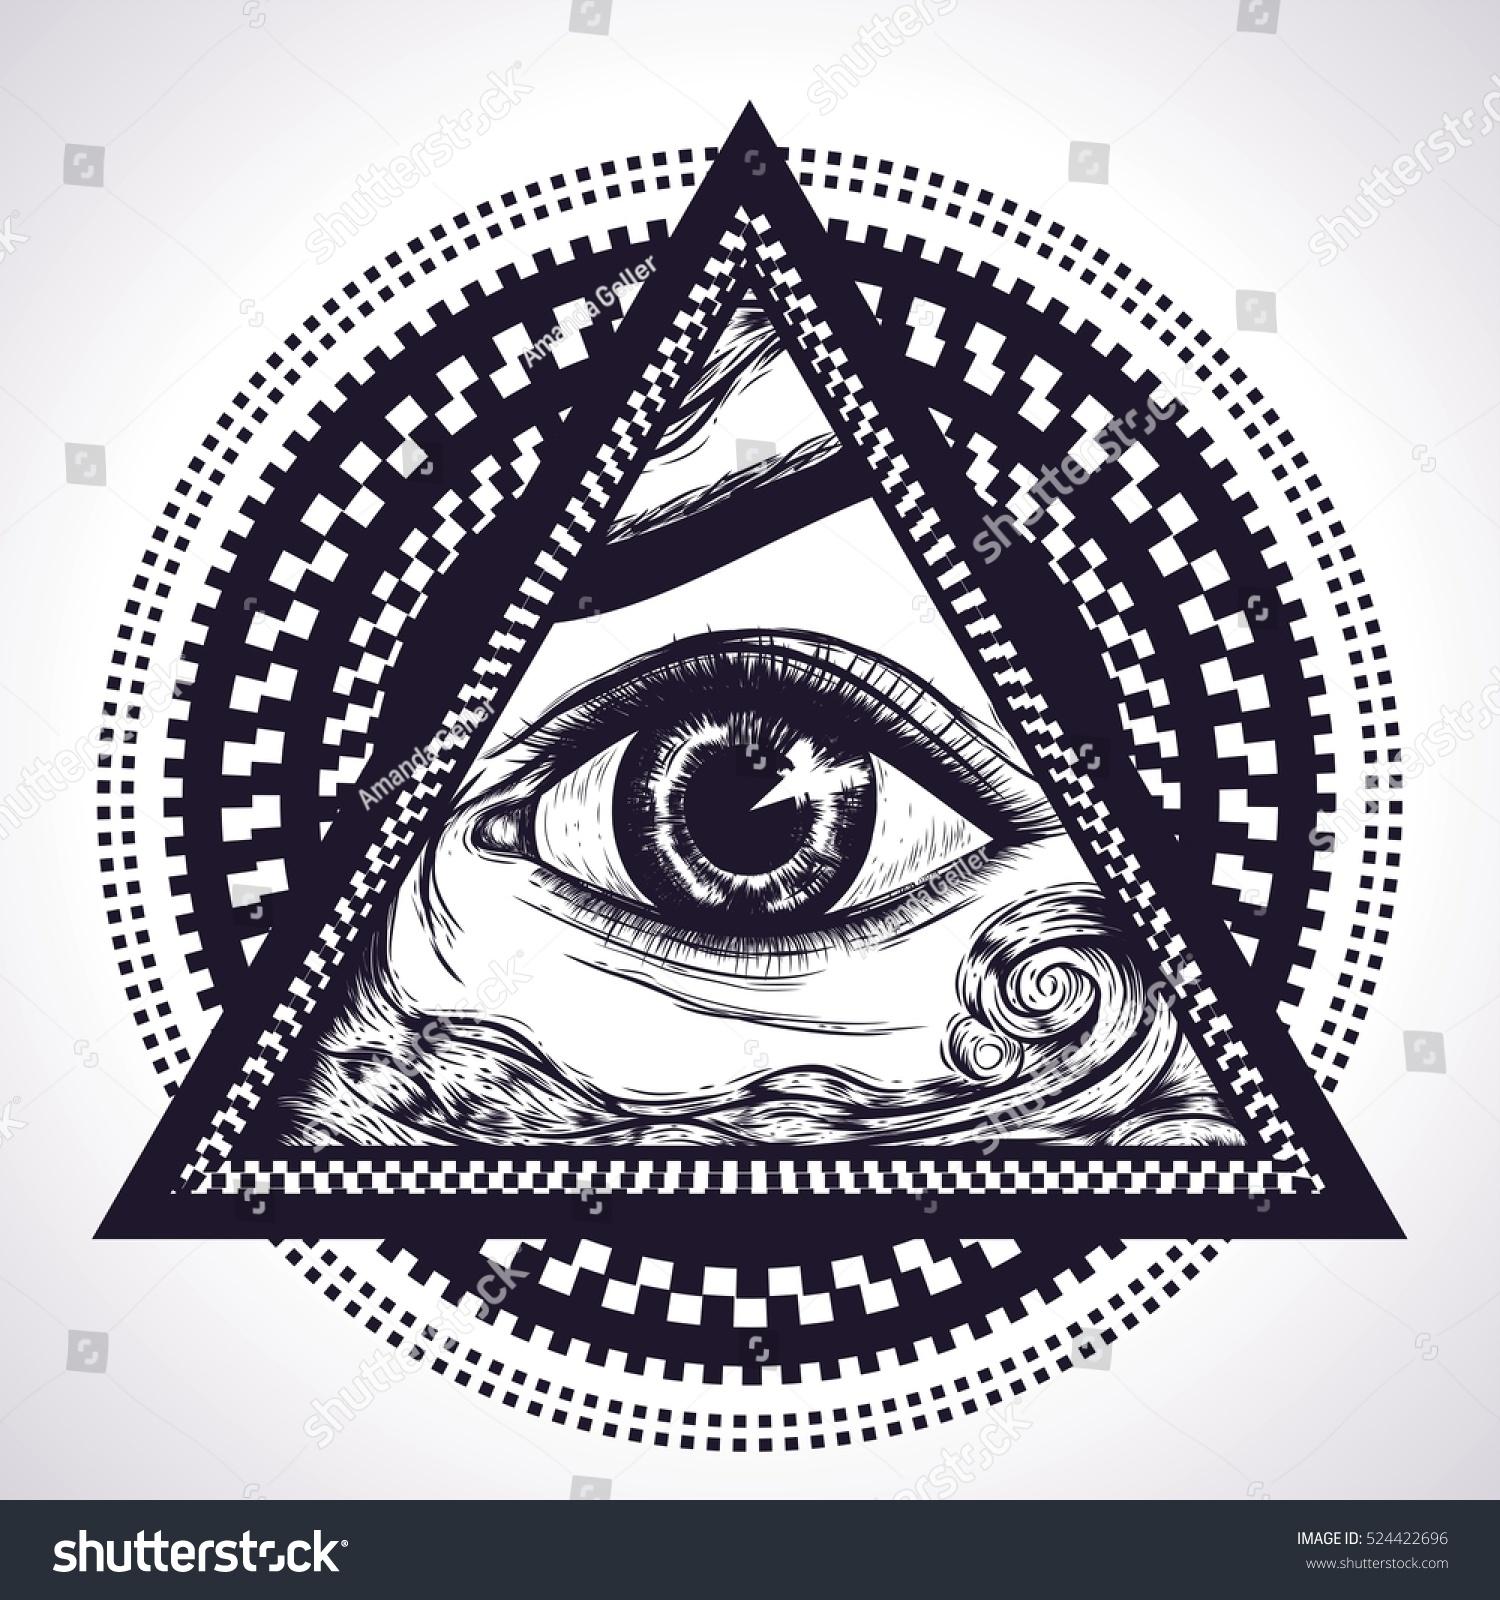 All Seeing Eye Pyramid Symbol Hypnotic Stock Photo Photo Vector